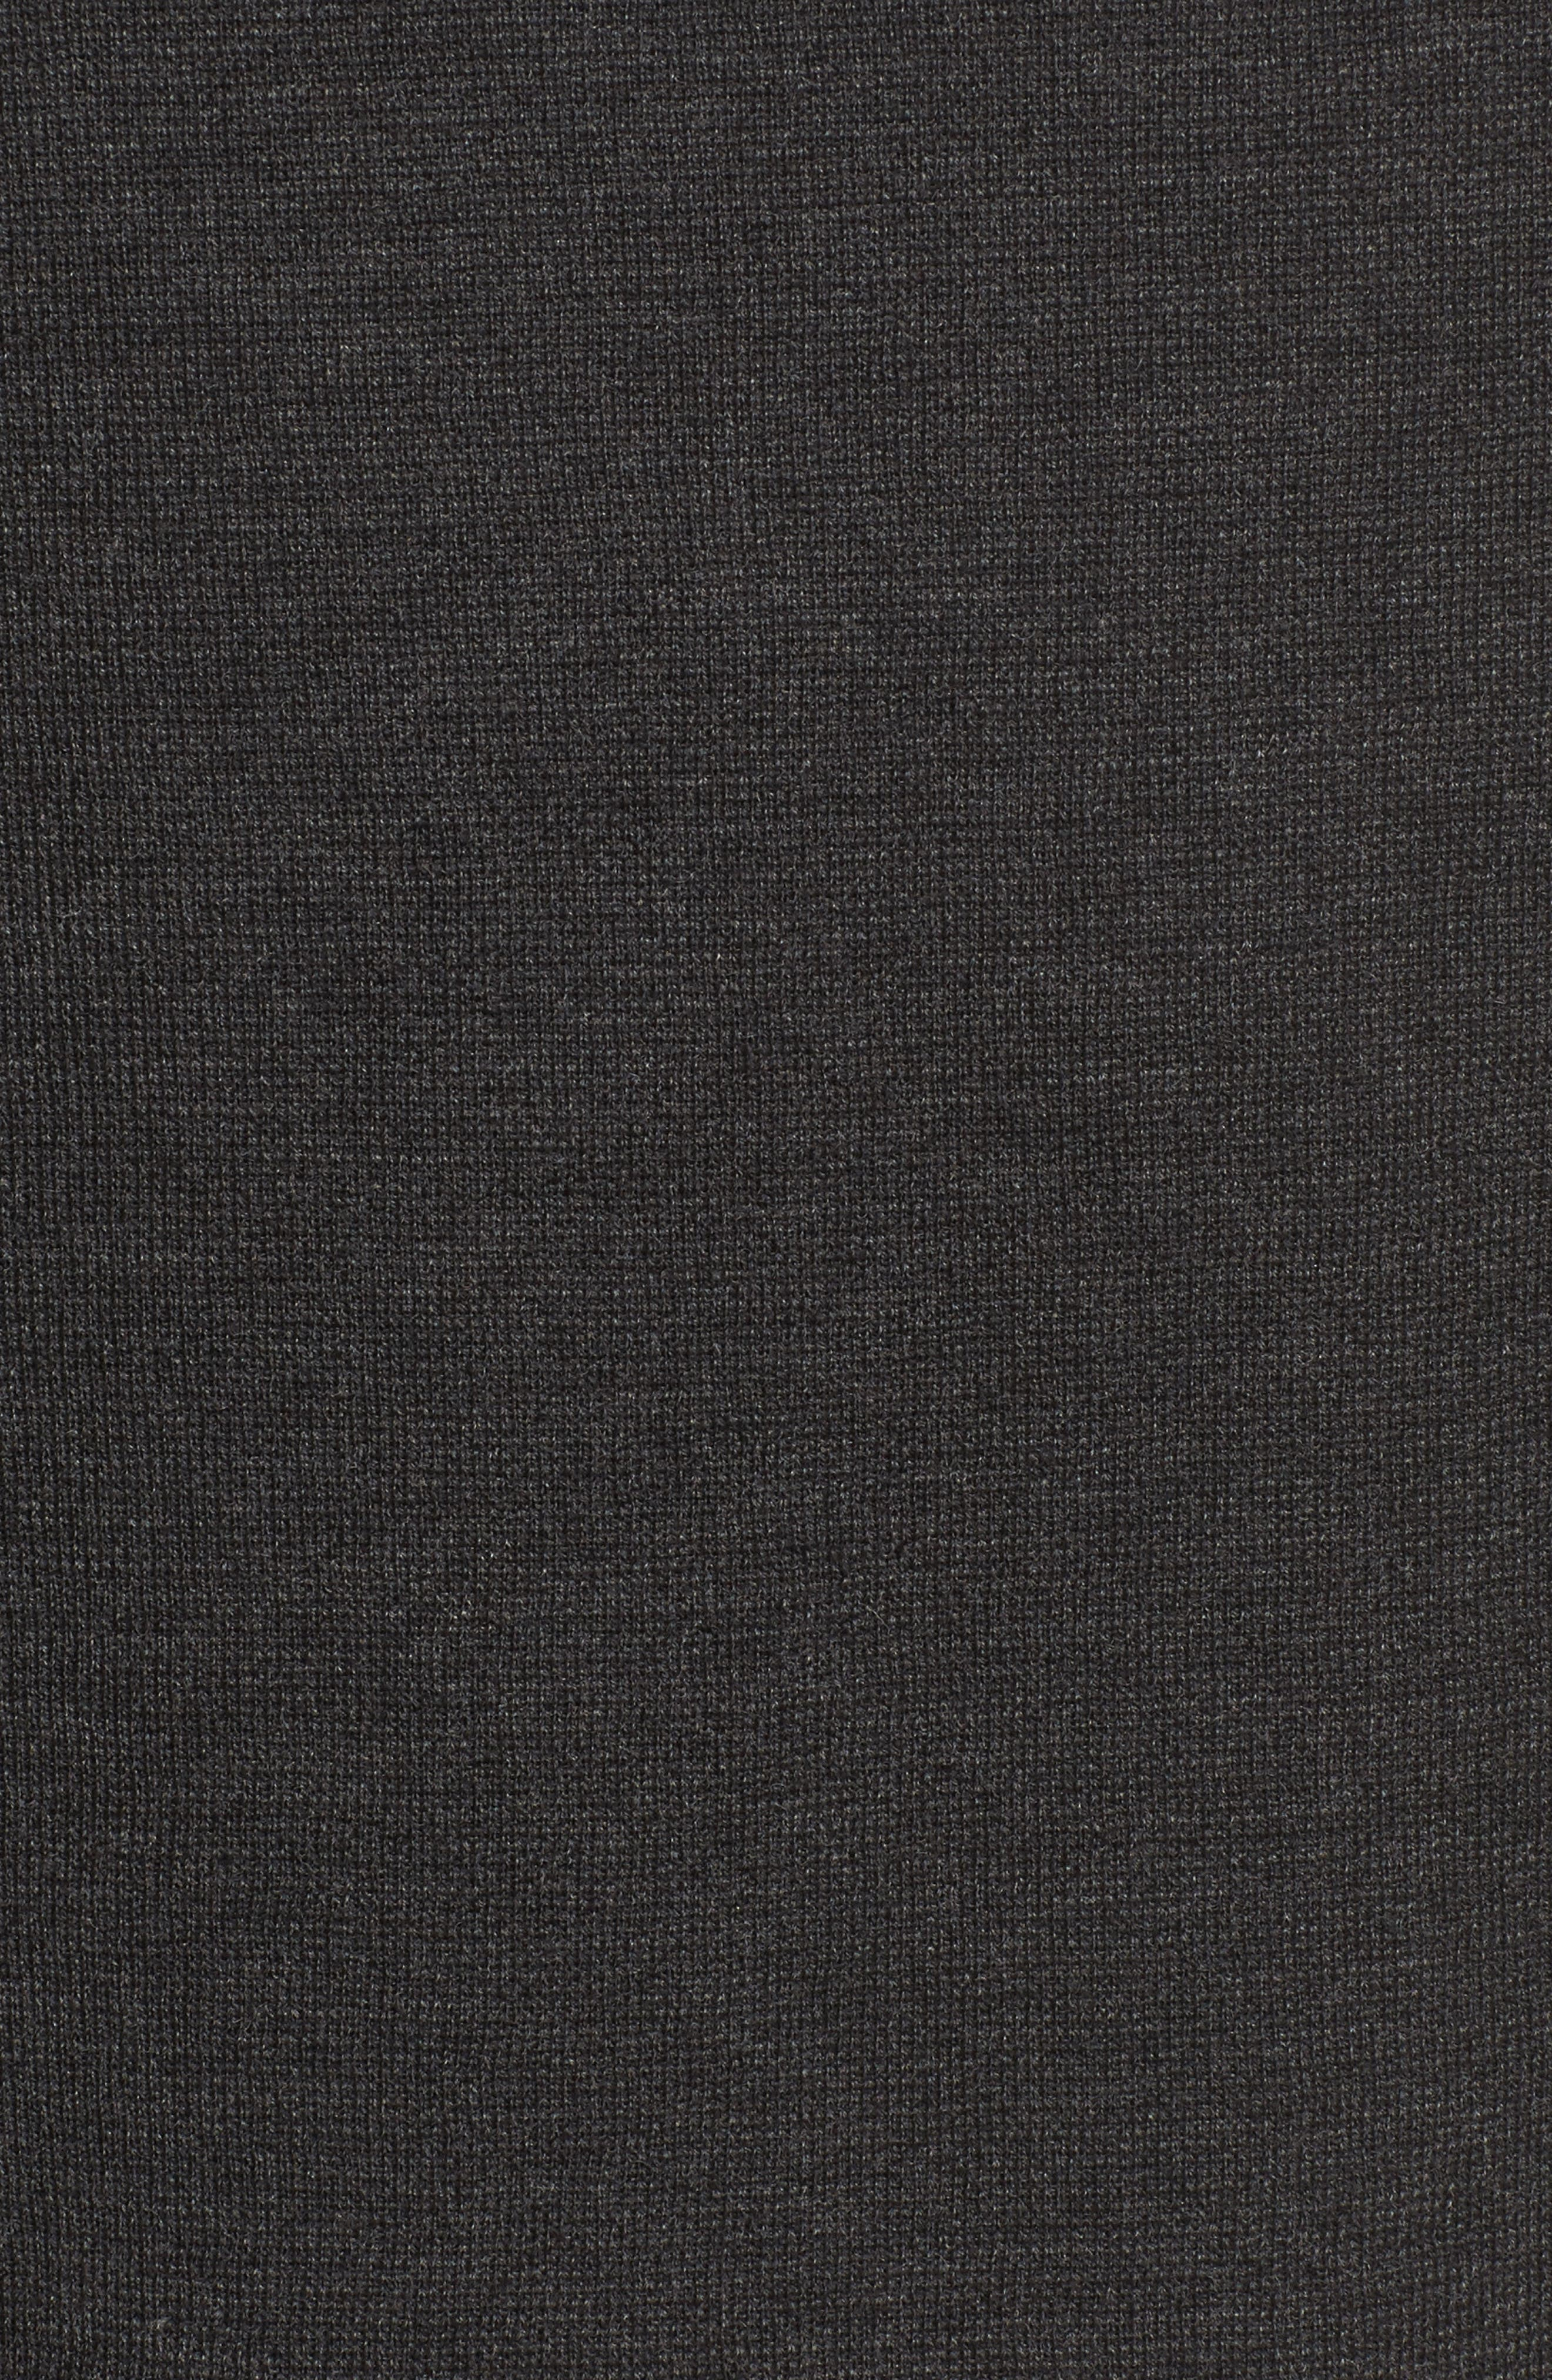 Merino Wool Sweater Dress,                             Alternate thumbnail 18, color,